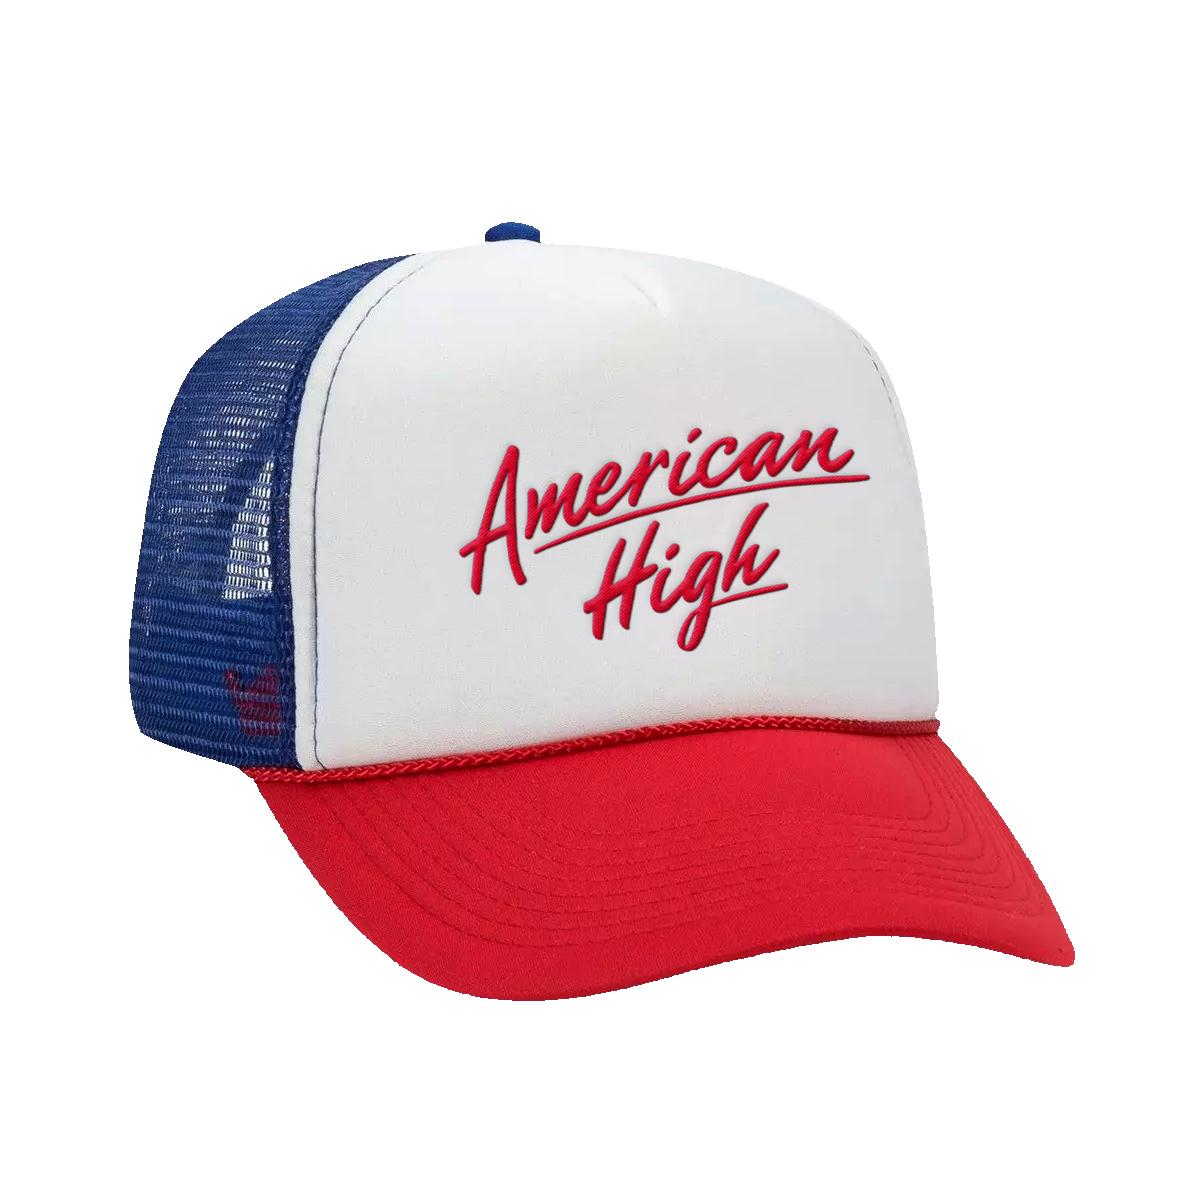 American High Trucker Hat